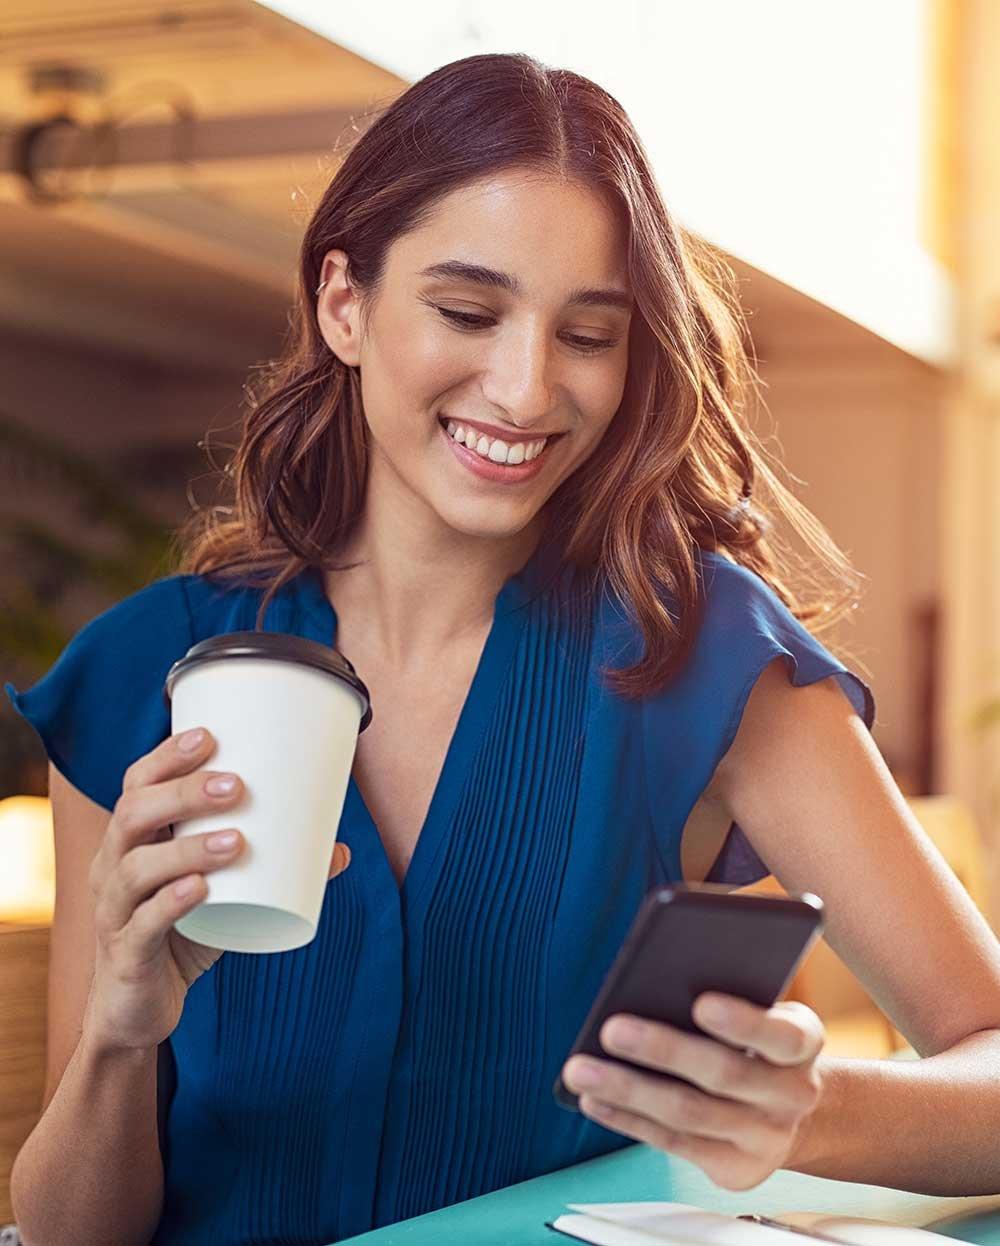 PrimeWay Digital Wallet Features